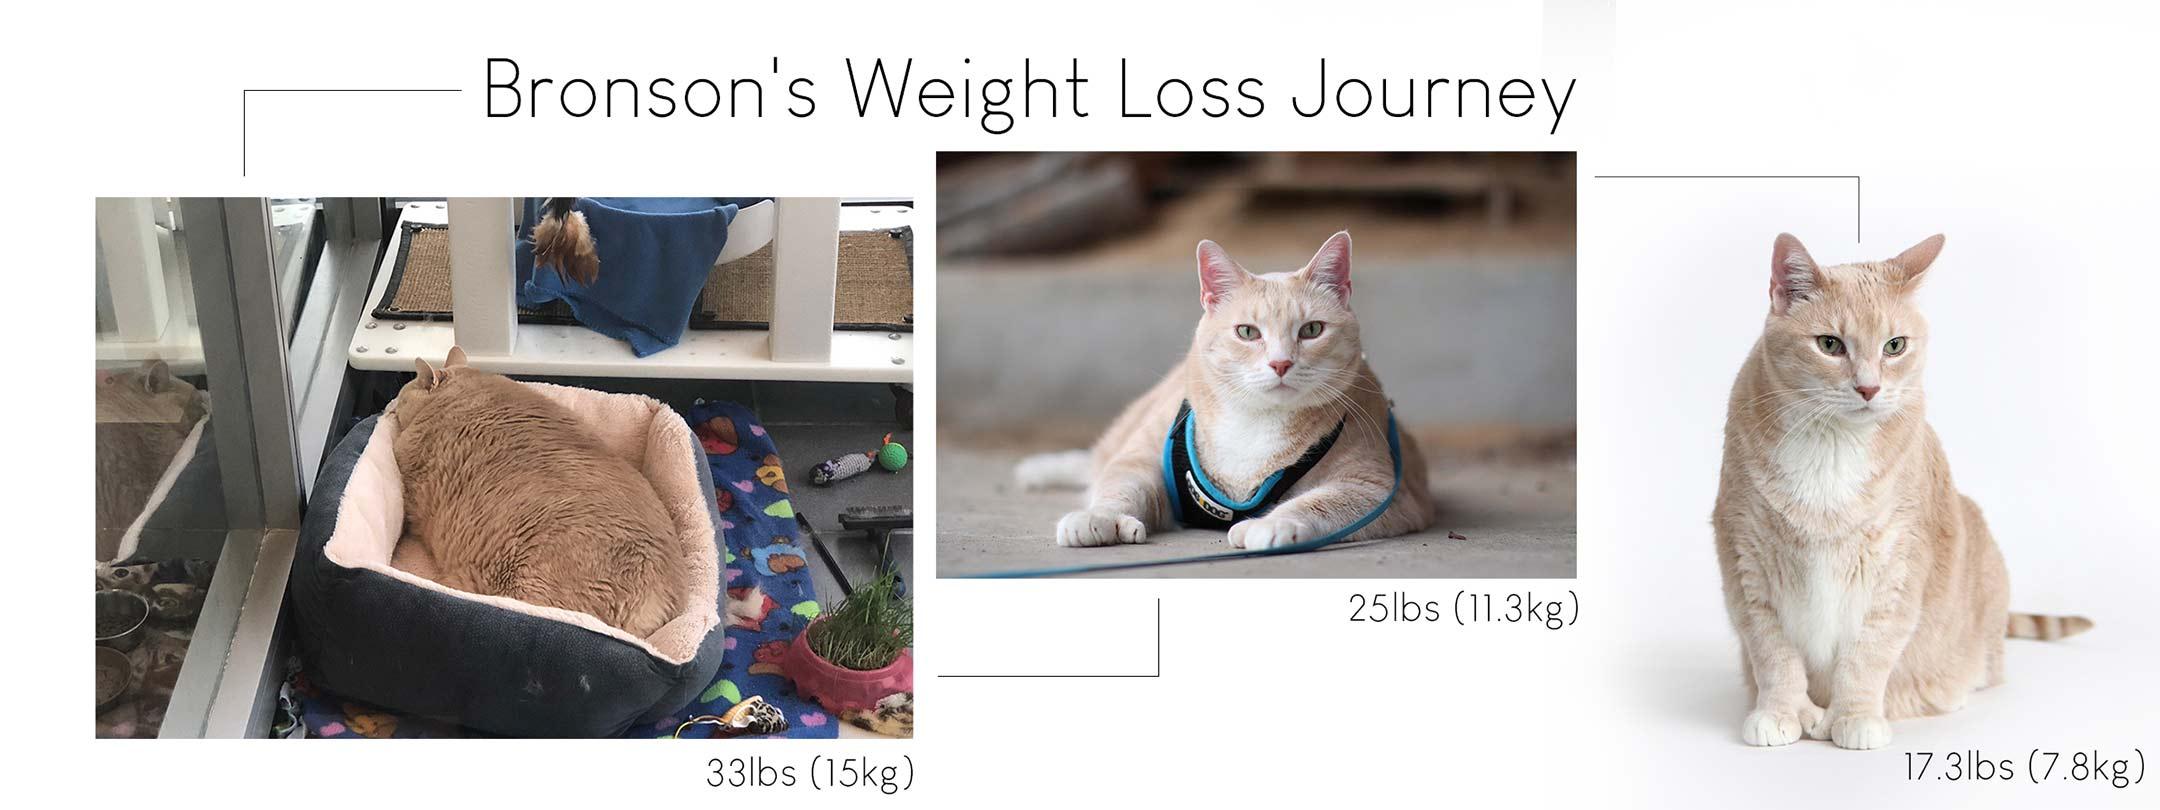 progress photos of bronson's weight loss